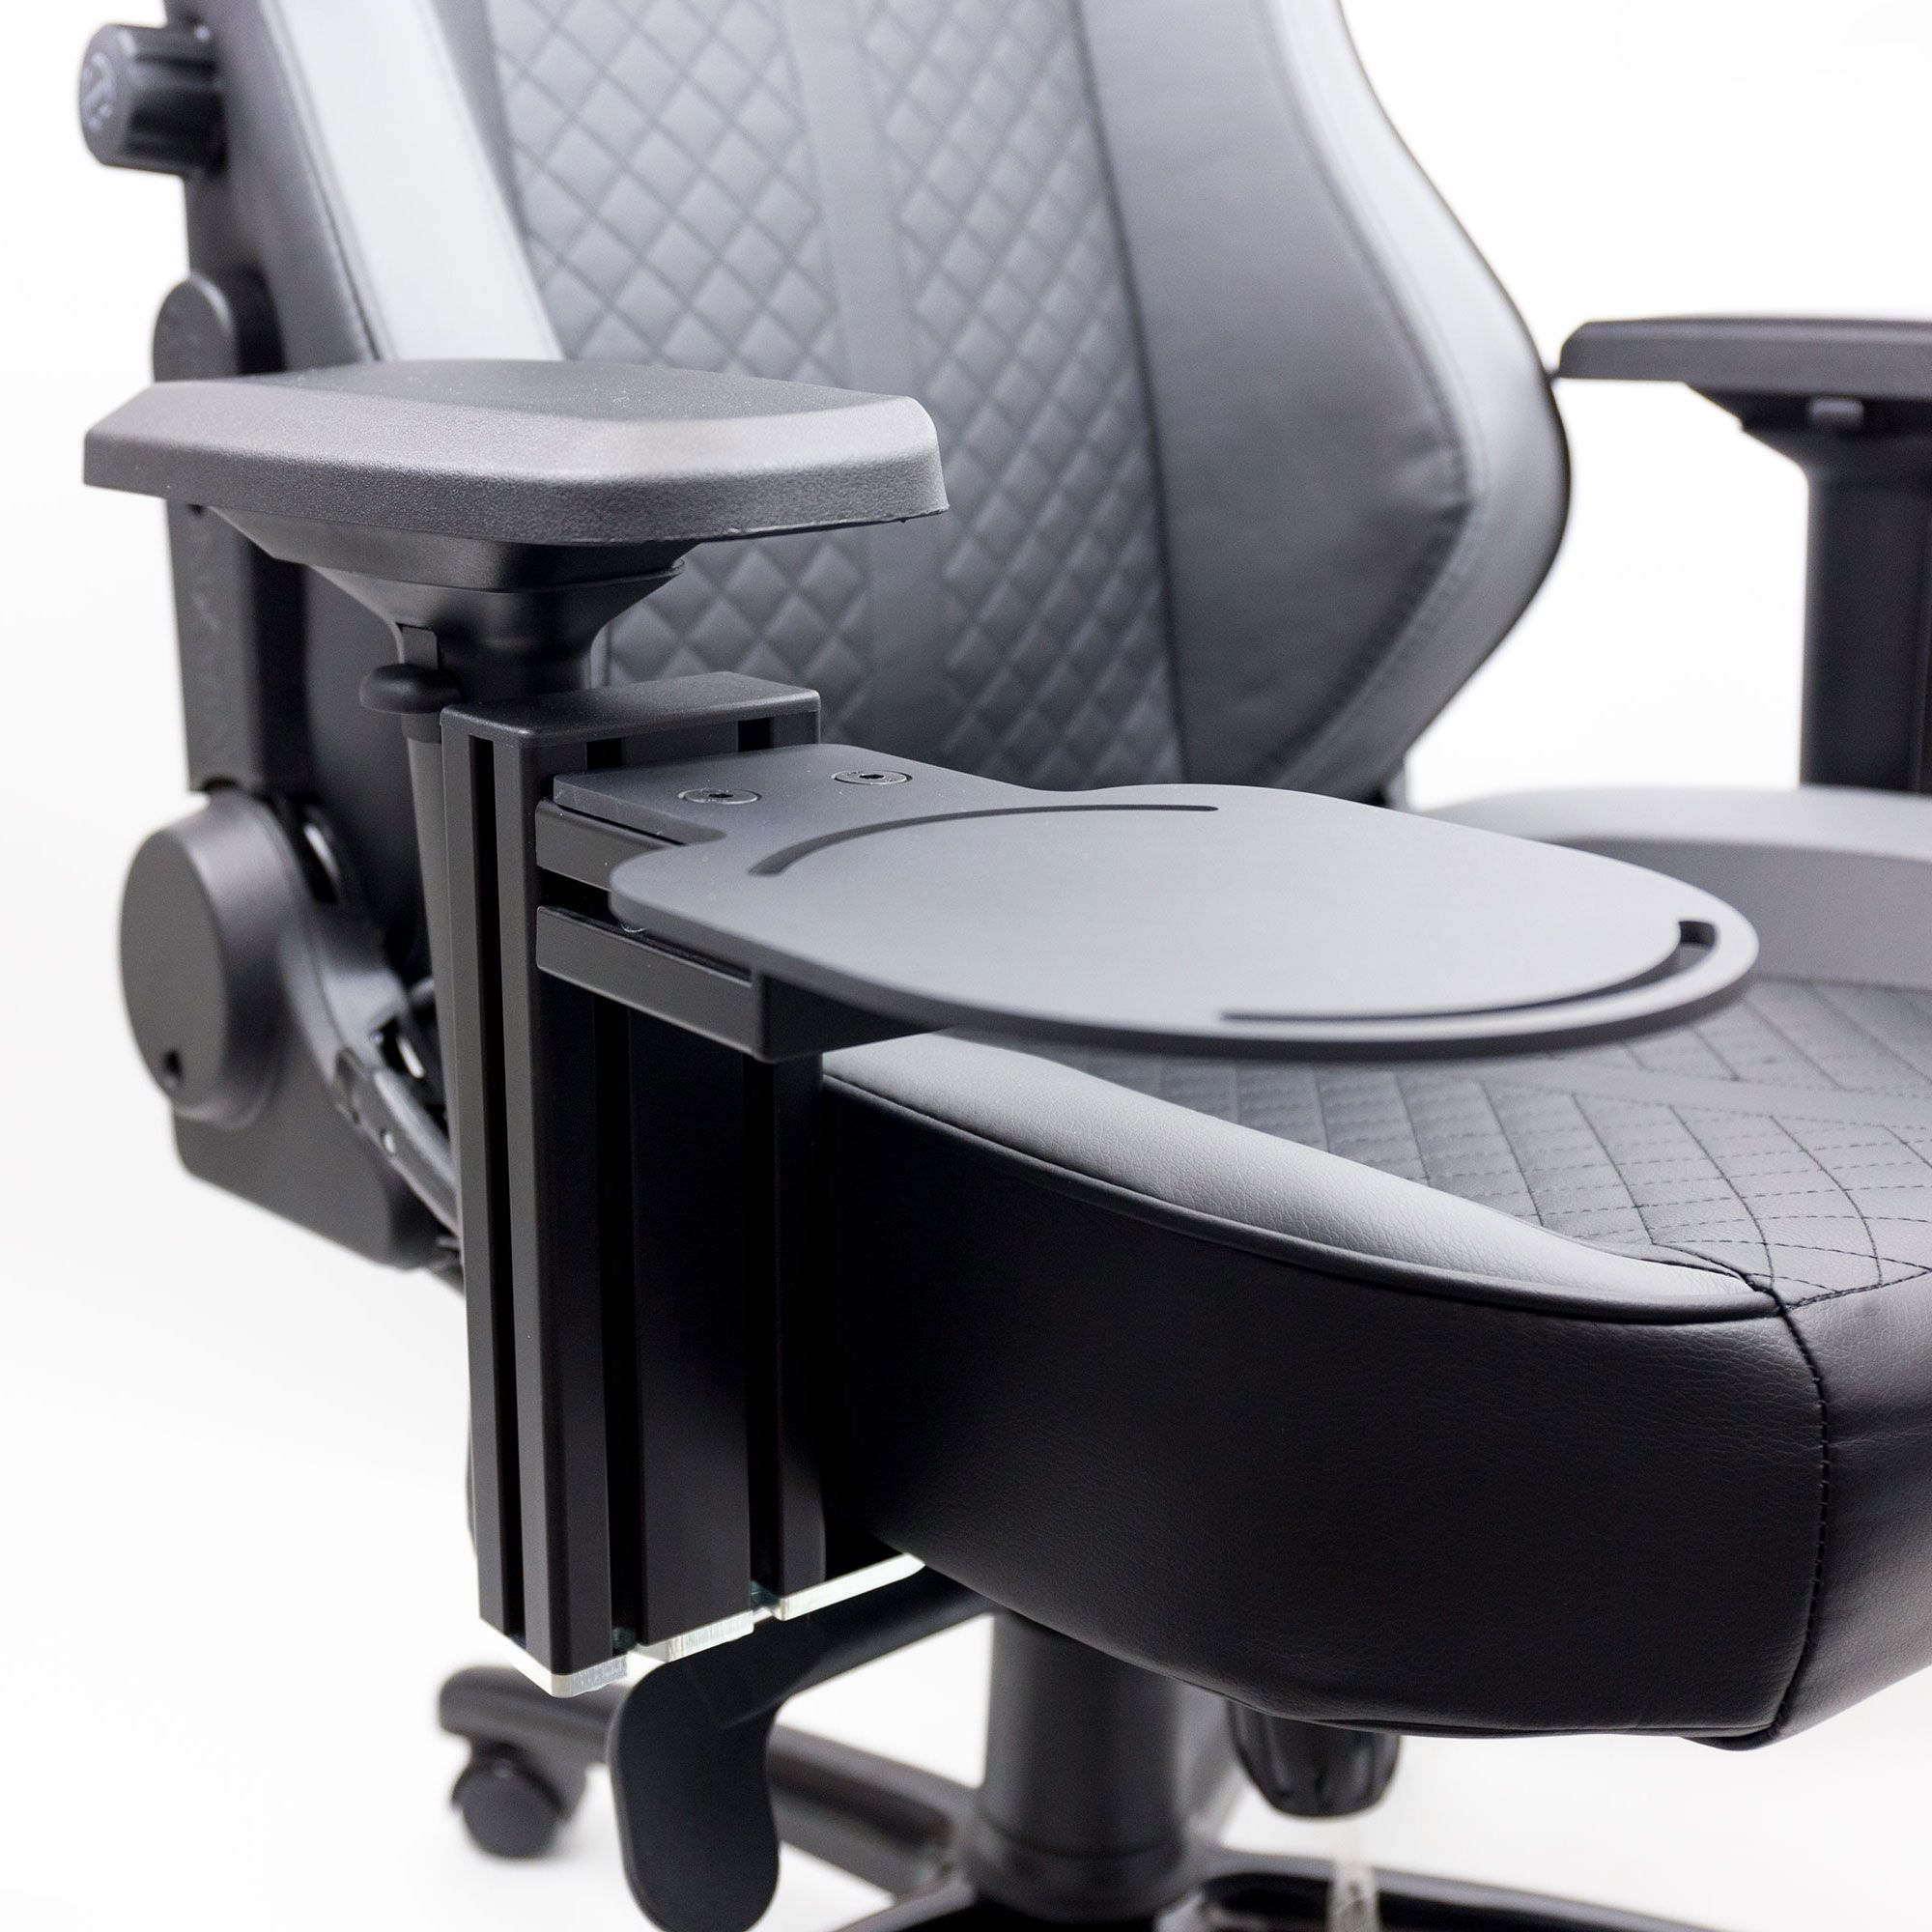 JoystickHOTAS Chair Mounts